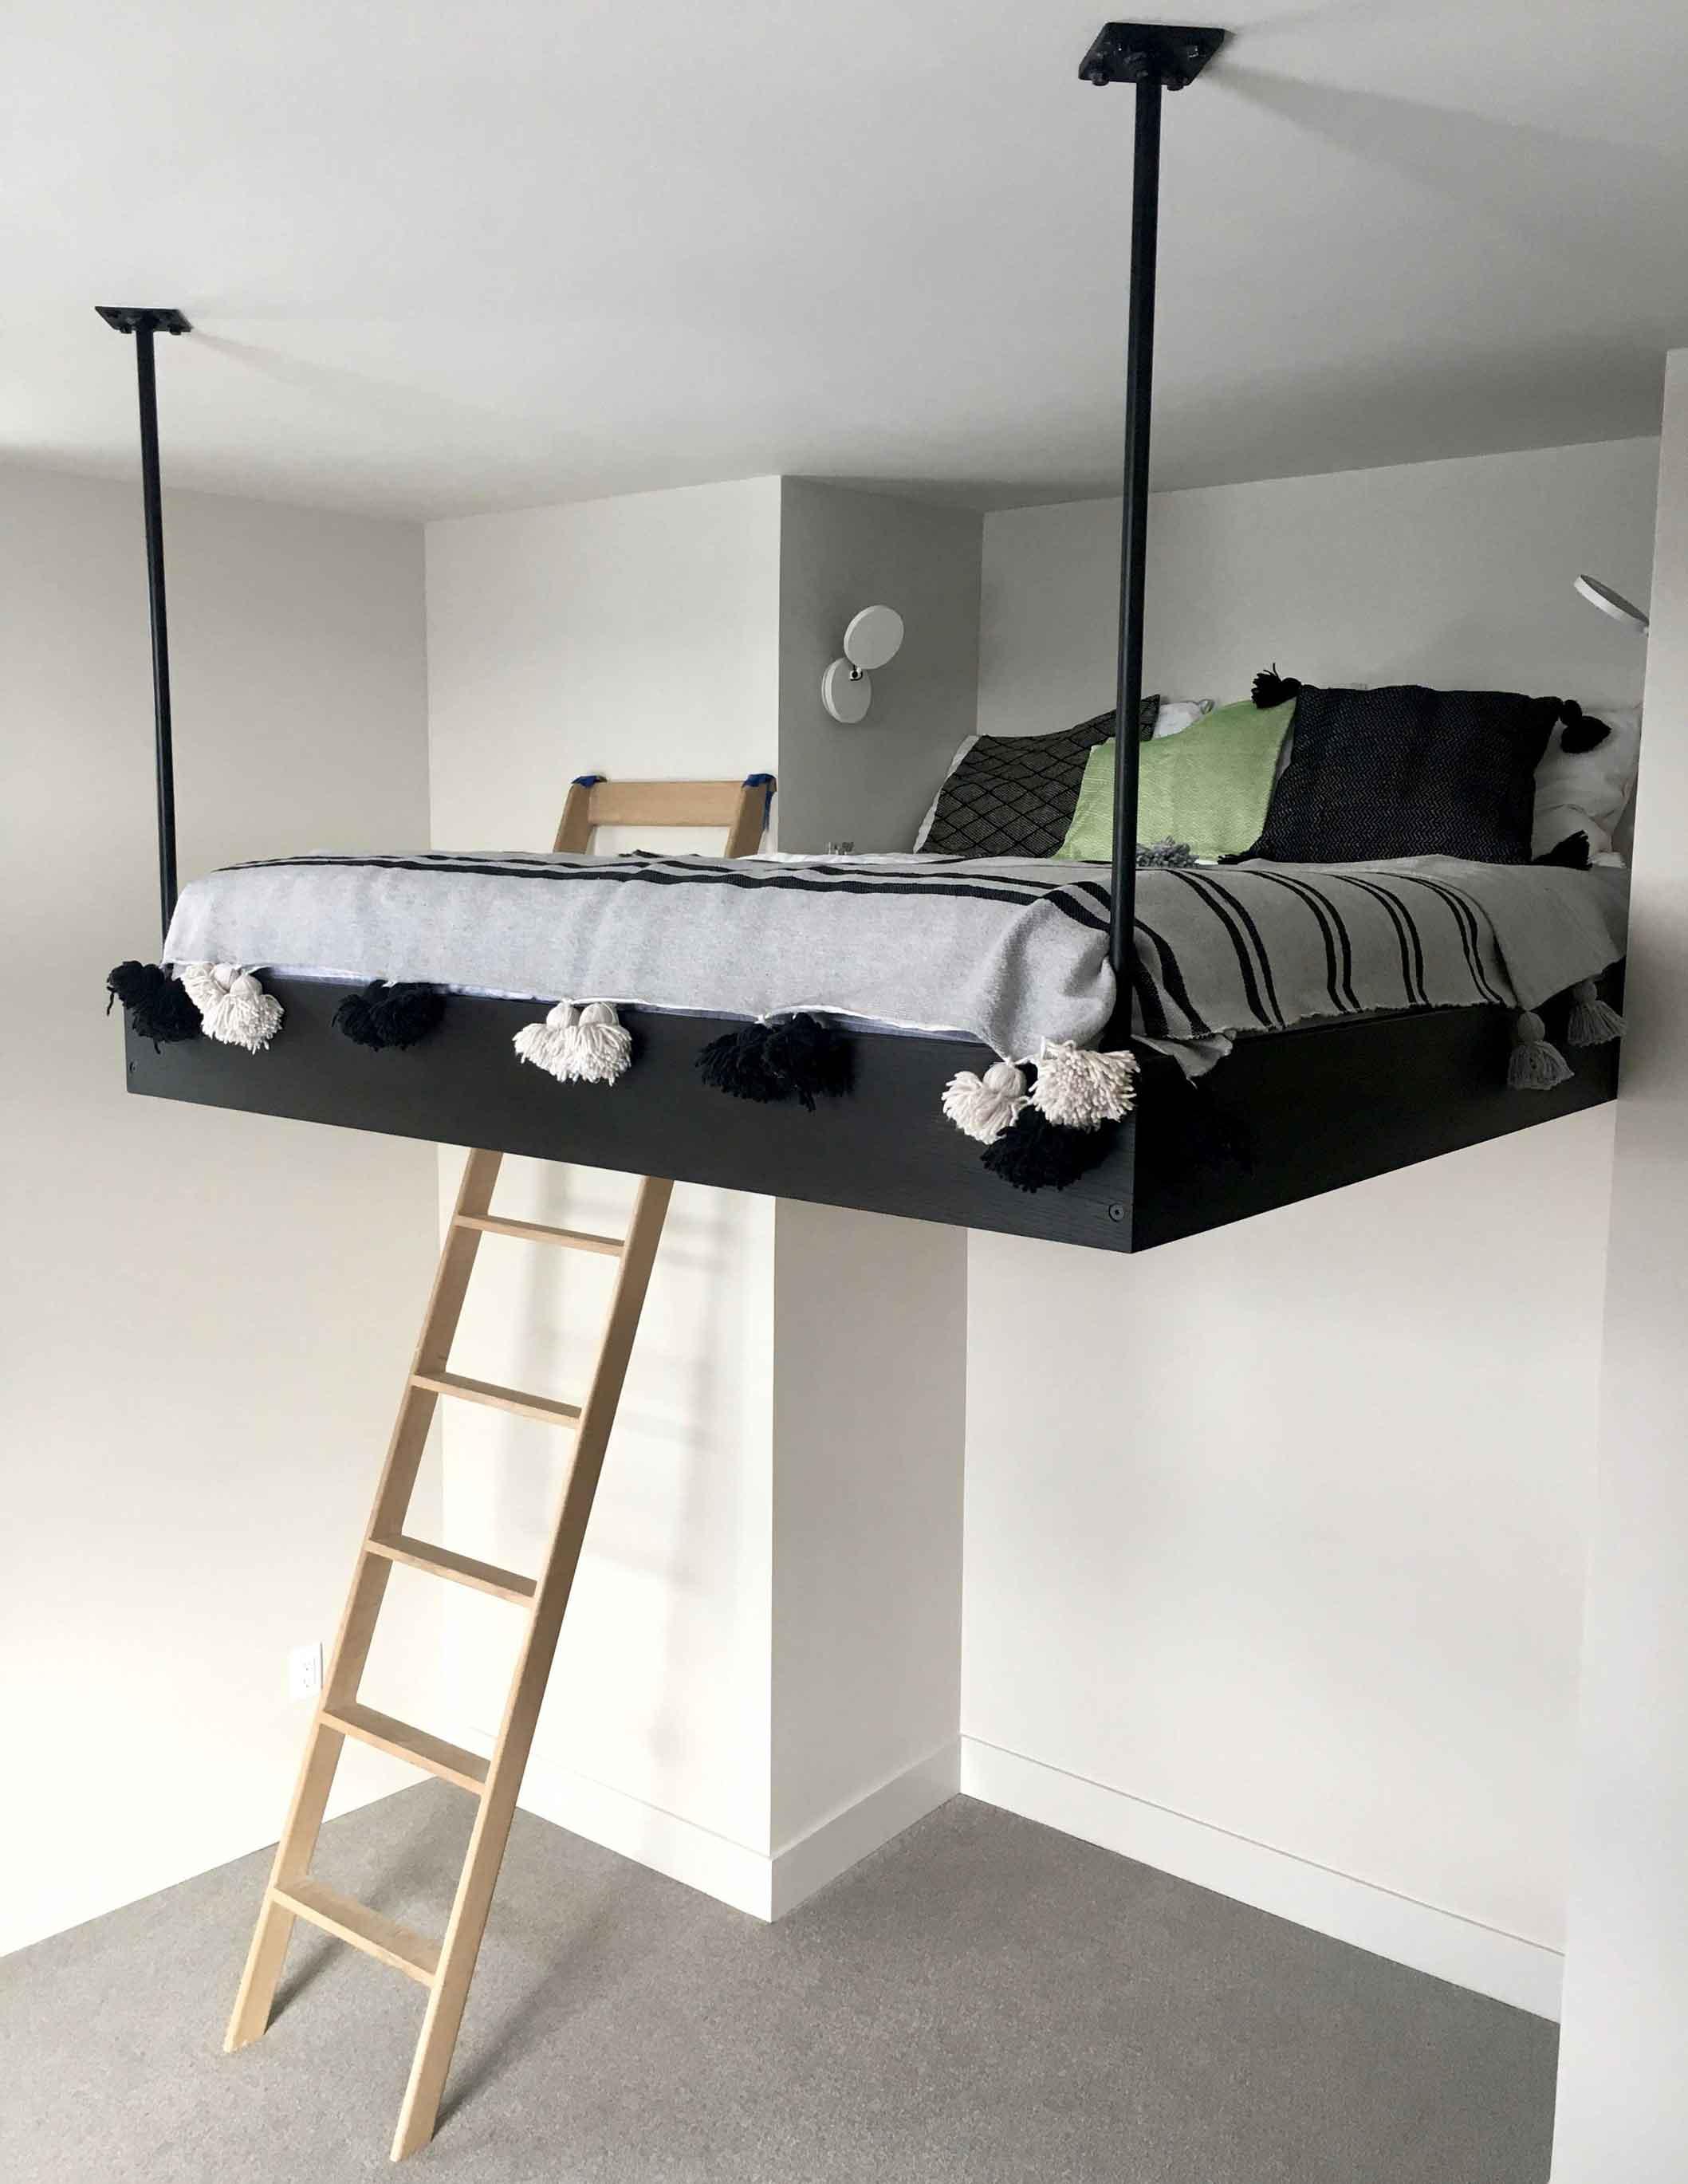 7-RiverHouse-loft-bed-PerpetuaWood-web.jpg